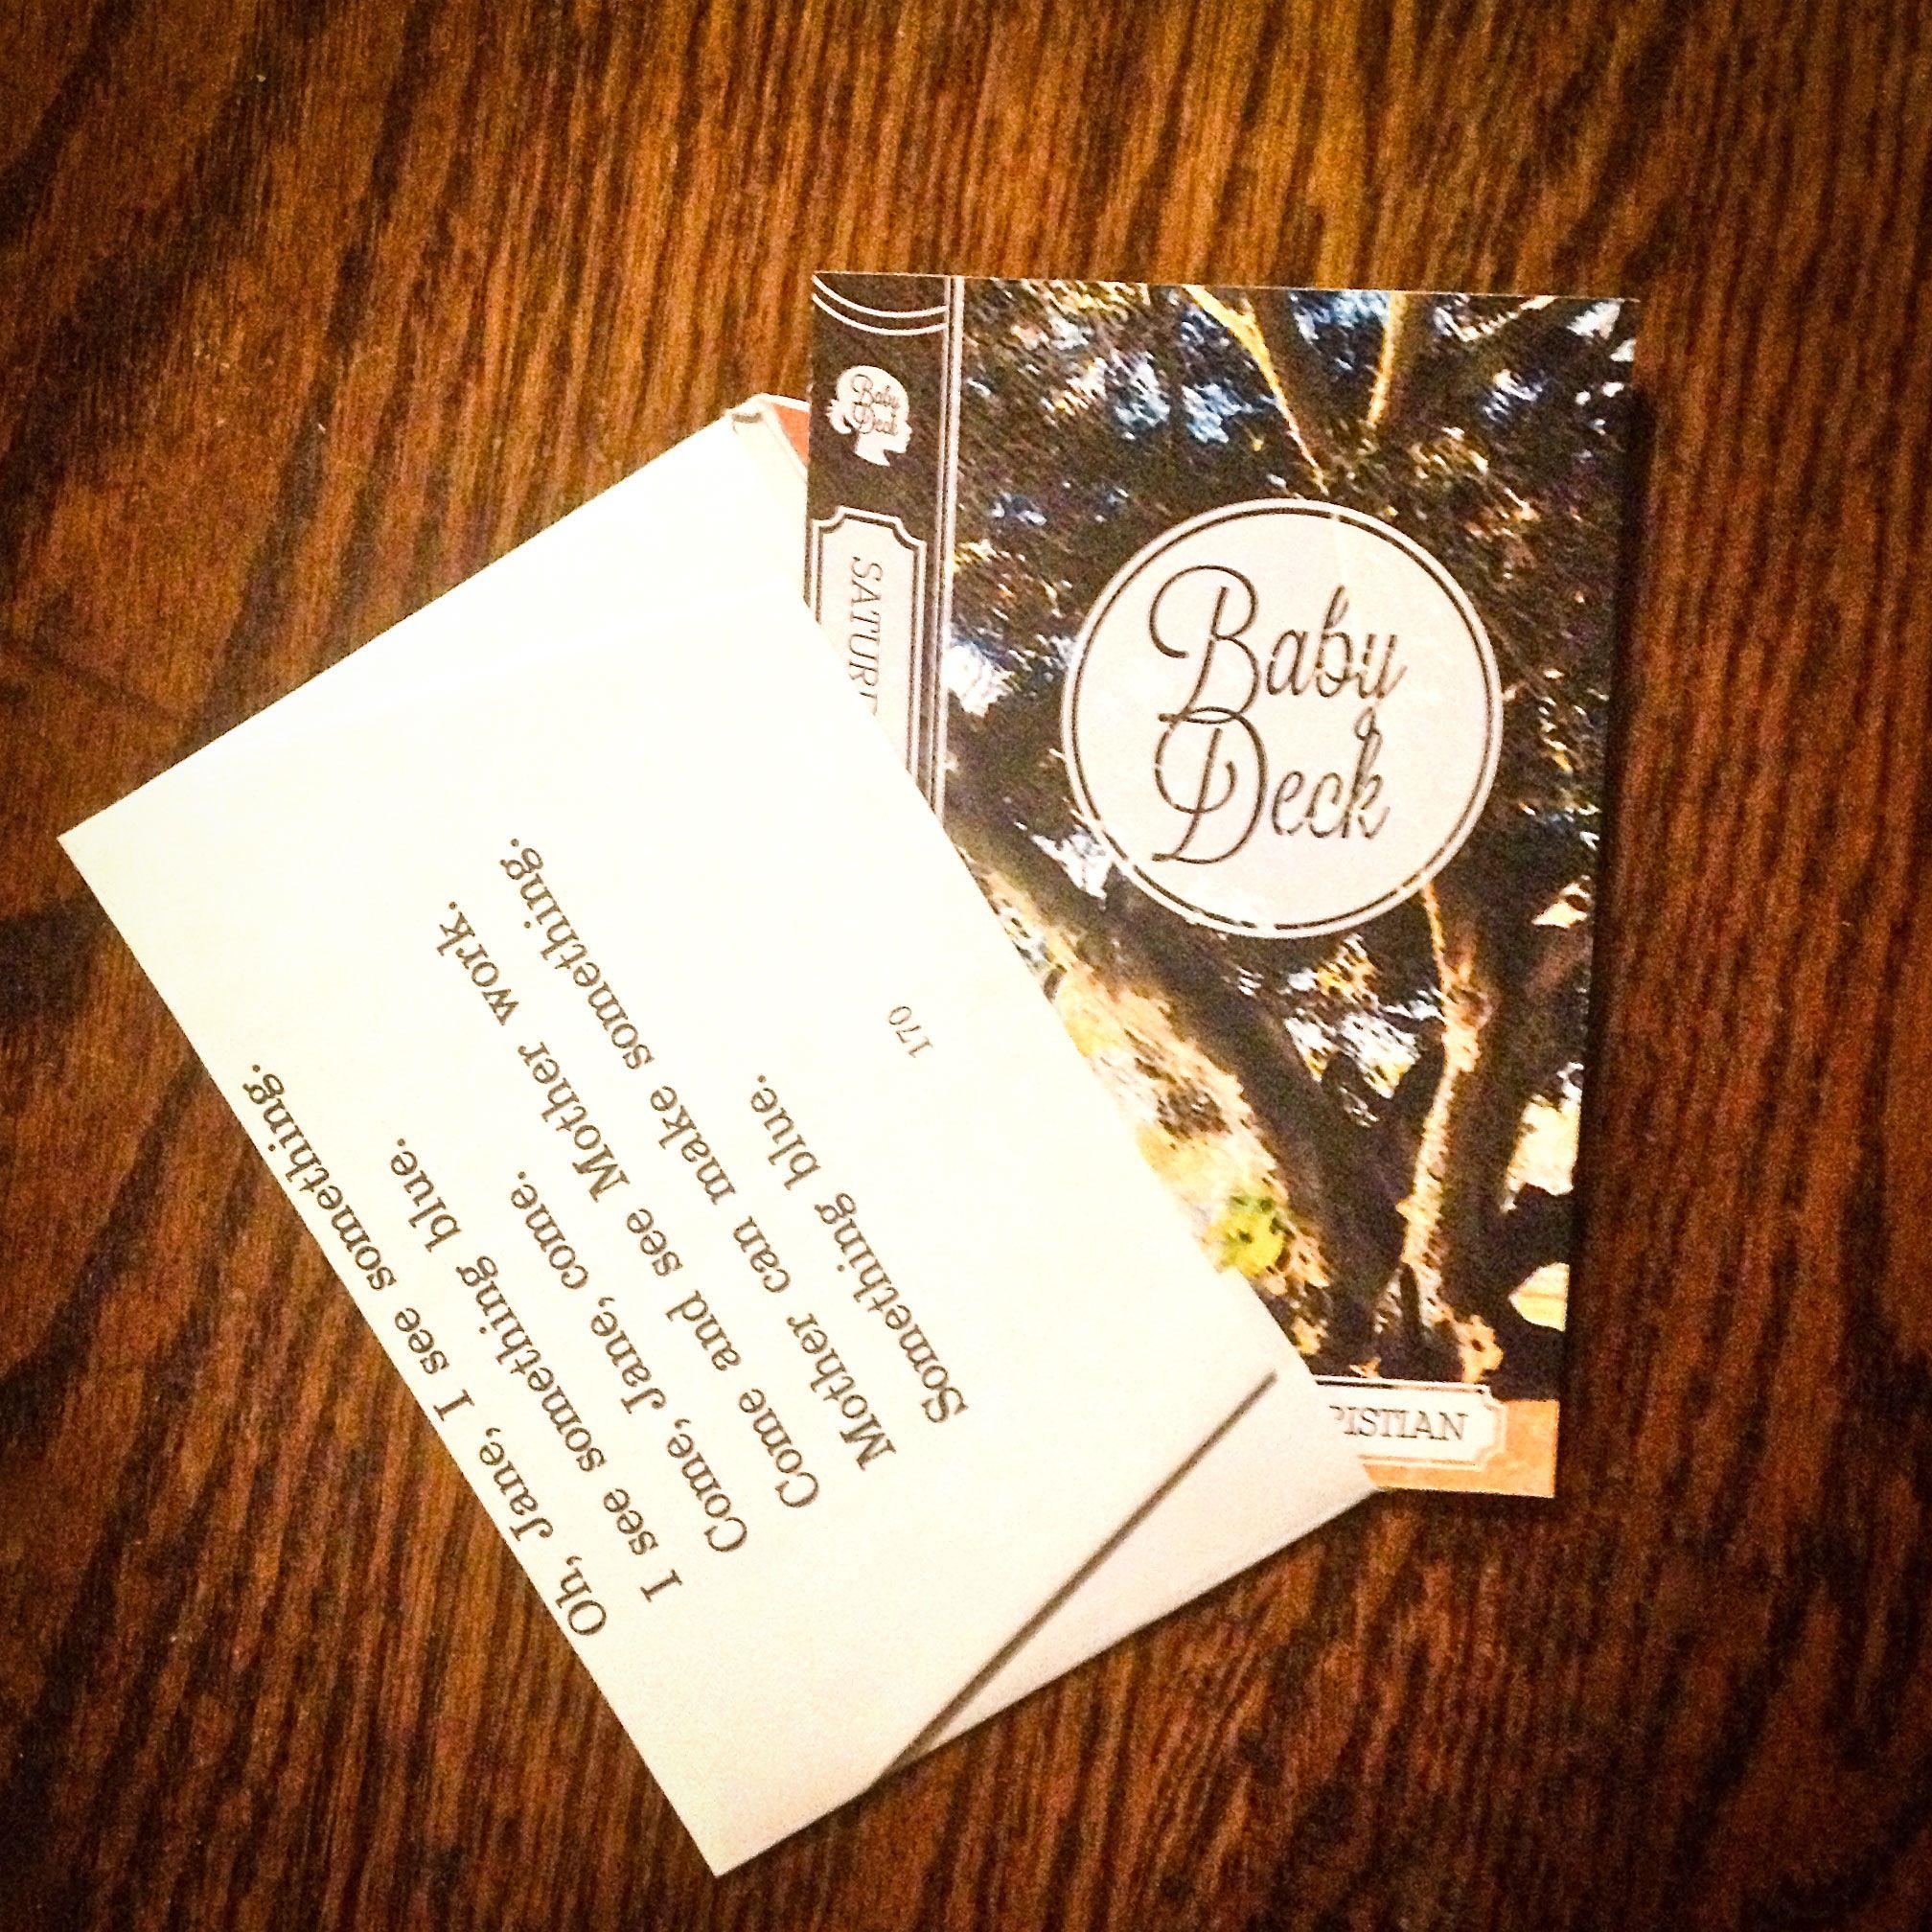 Storybook baby shower invites #invitation #baby #theme